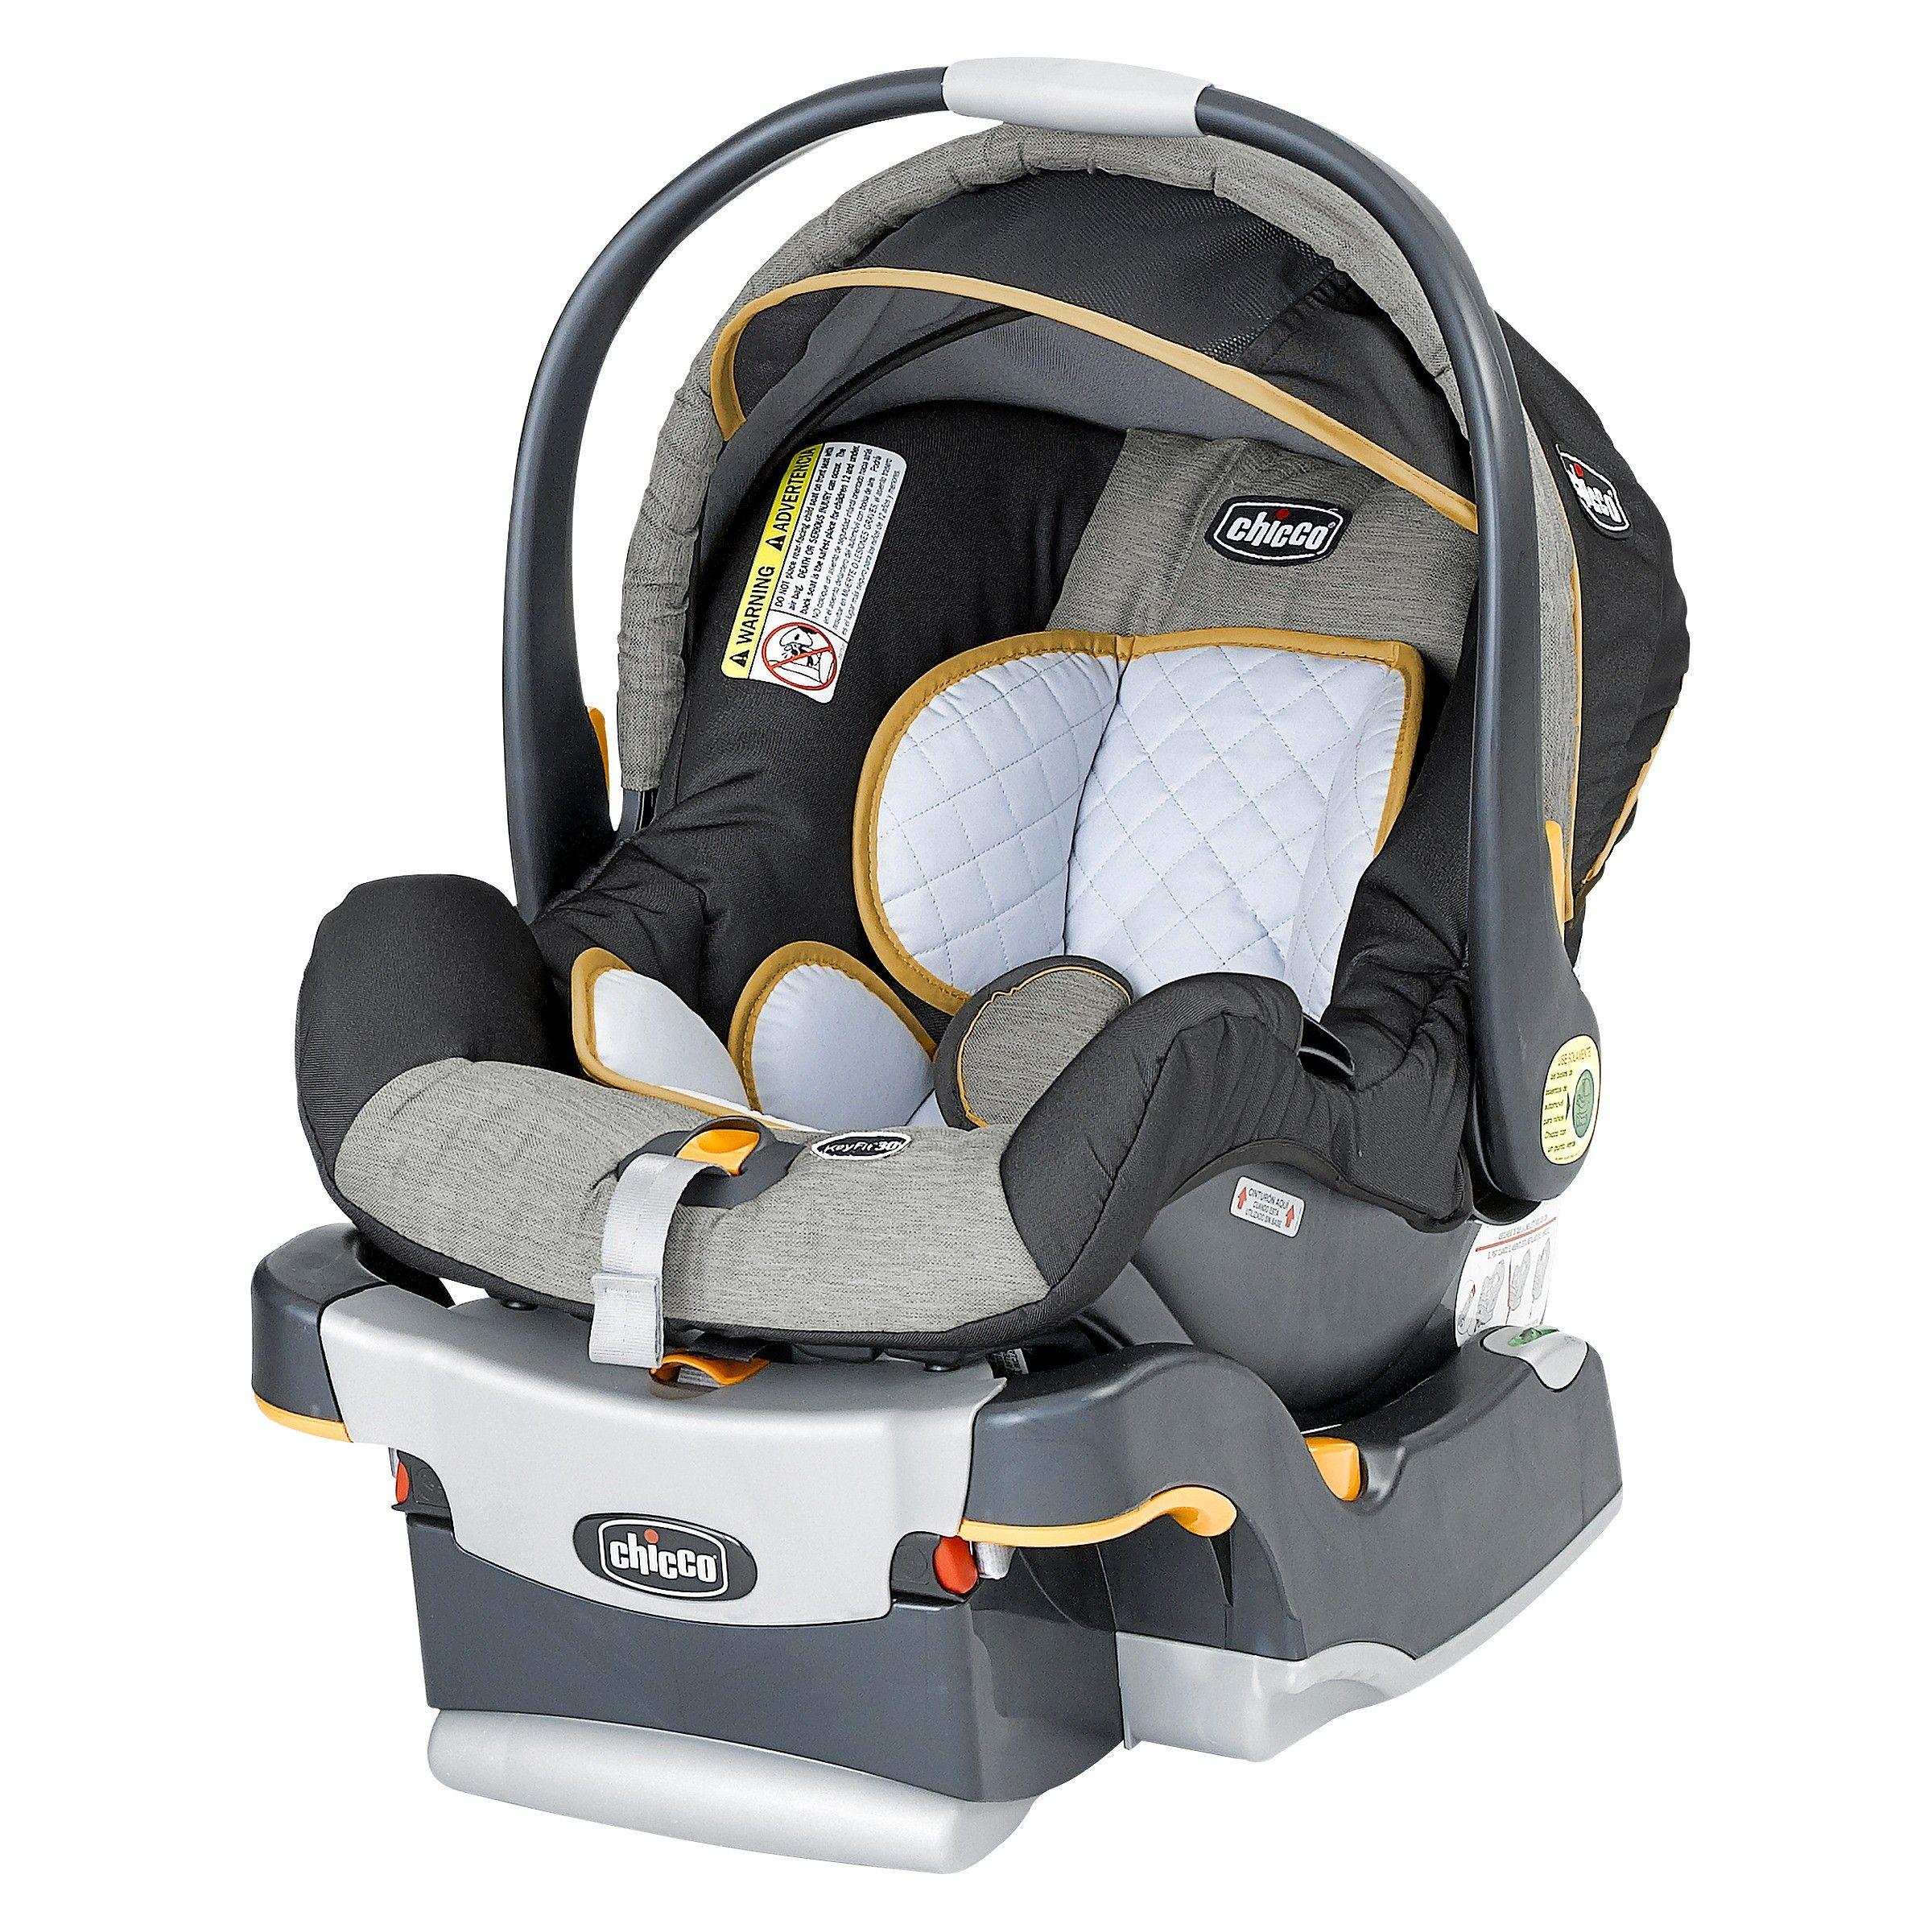 Chicco KeyFit® 30 Infant Car Seat Target little